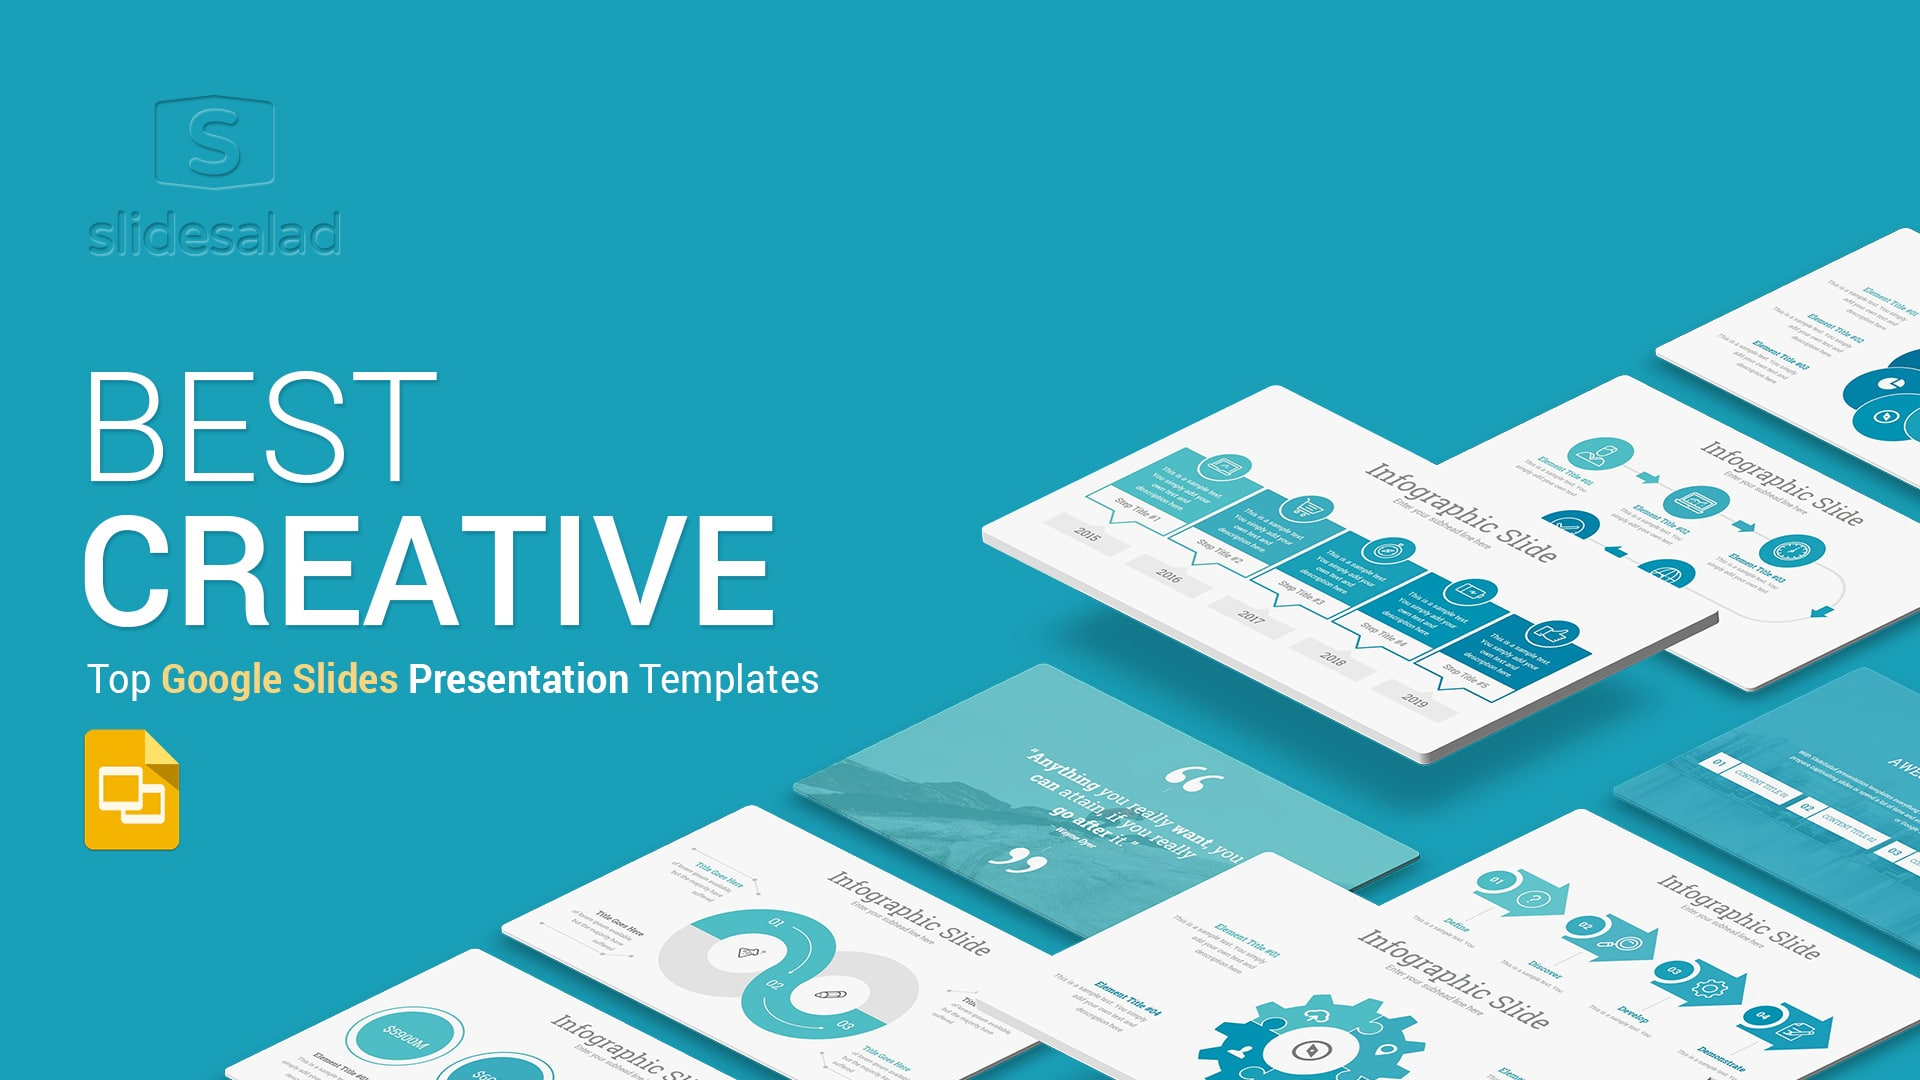 Creative Google Slides Presentation Template - Best Elegant Google Slides Template